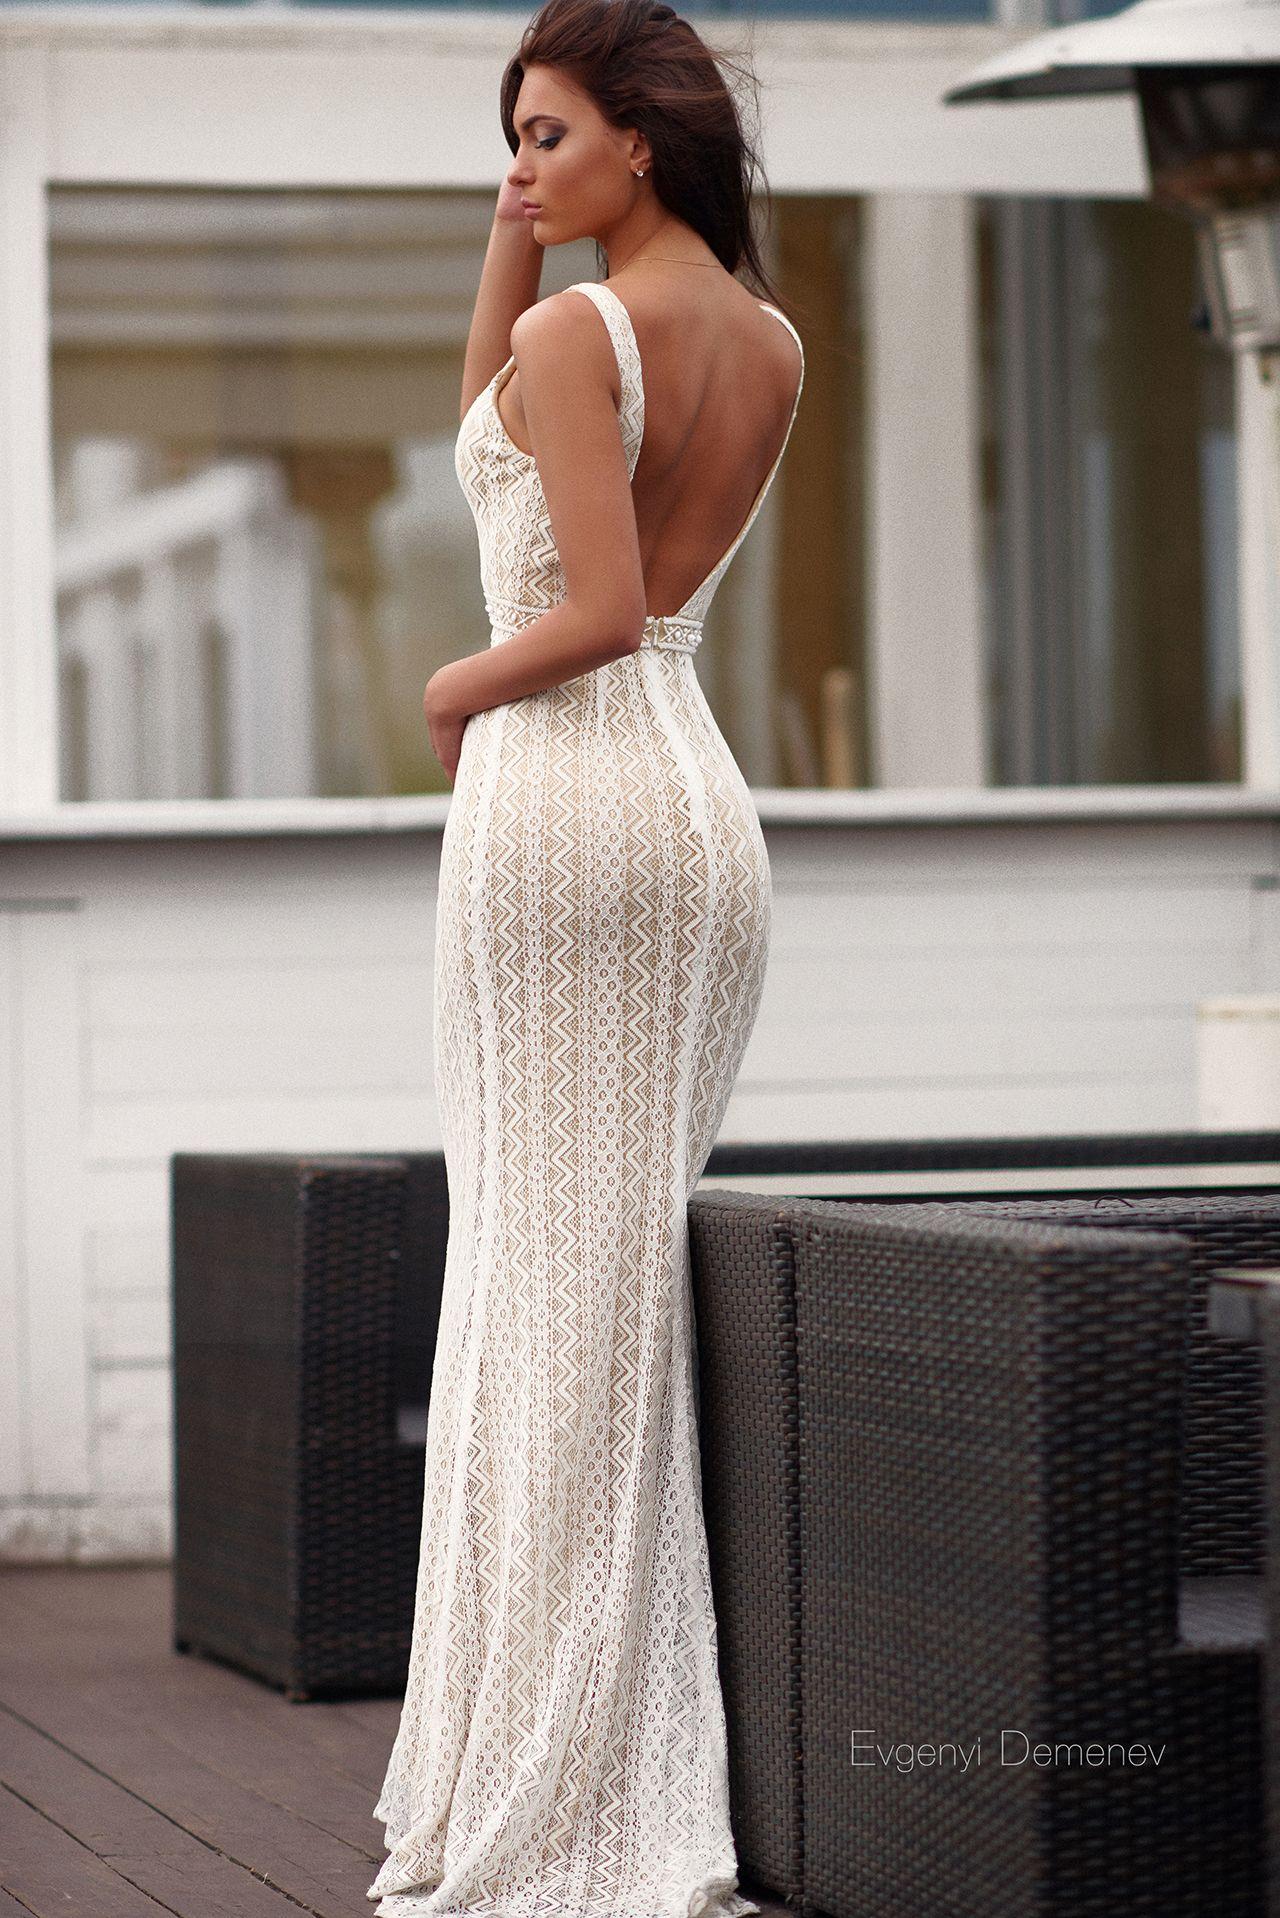 Ladies Dresses Tumblr